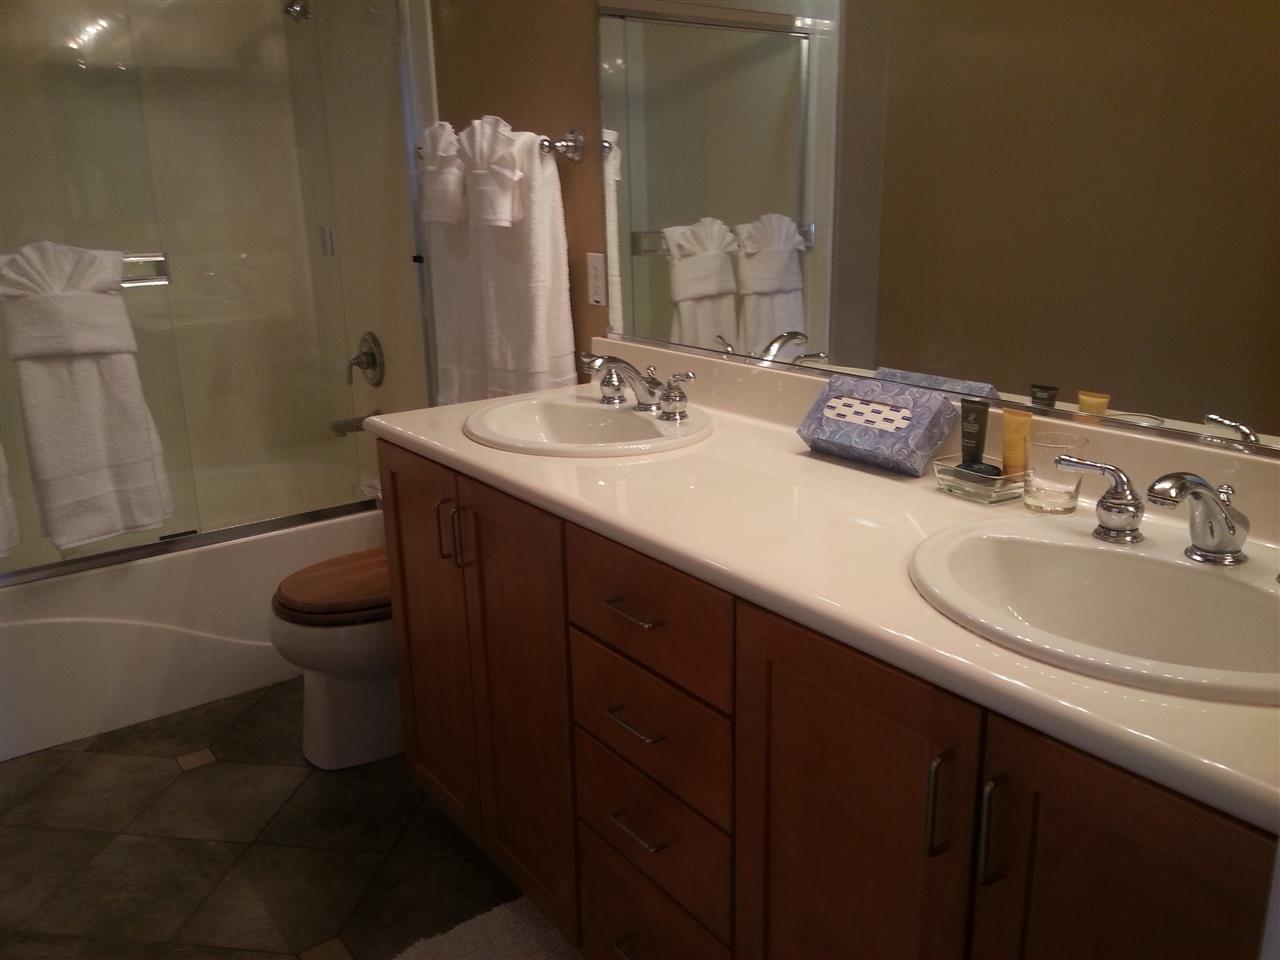 Additional photo for property listing at 22861 KINGSFORD WAY  Hayward, California 94541 United States